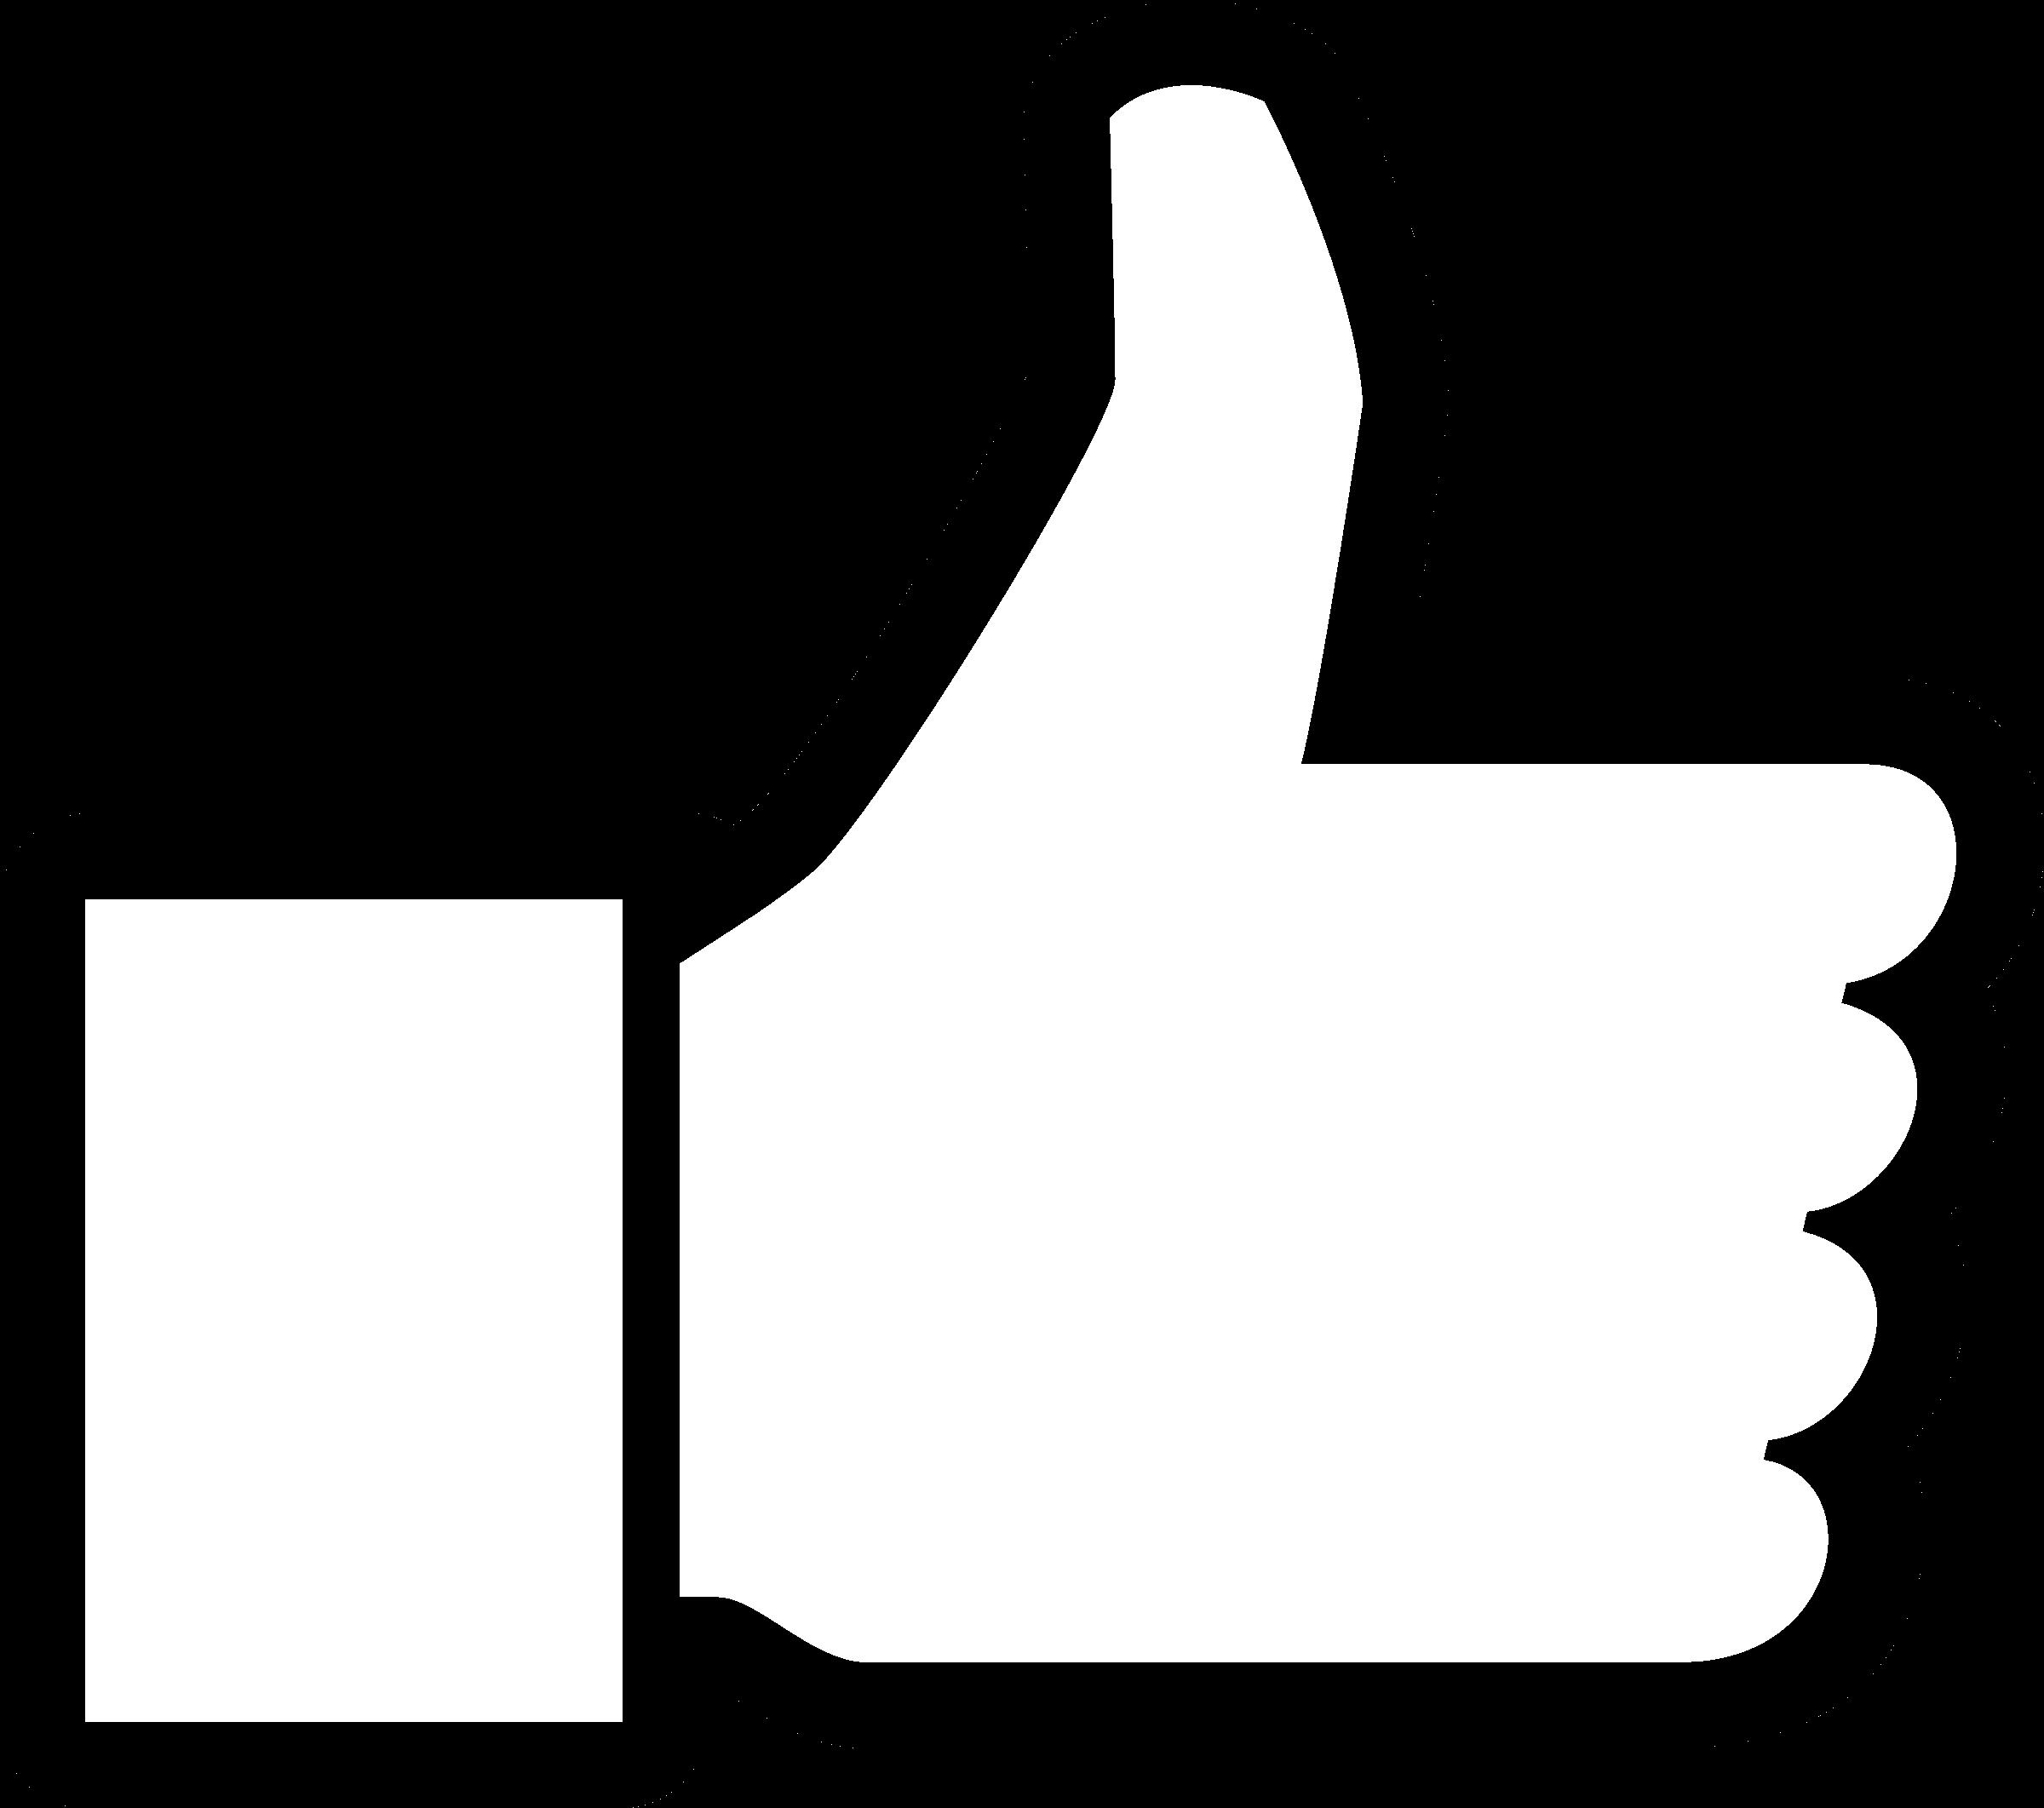 Thumbs Up Facebook Logo Png Transparent Svg Vector Freebie Supply